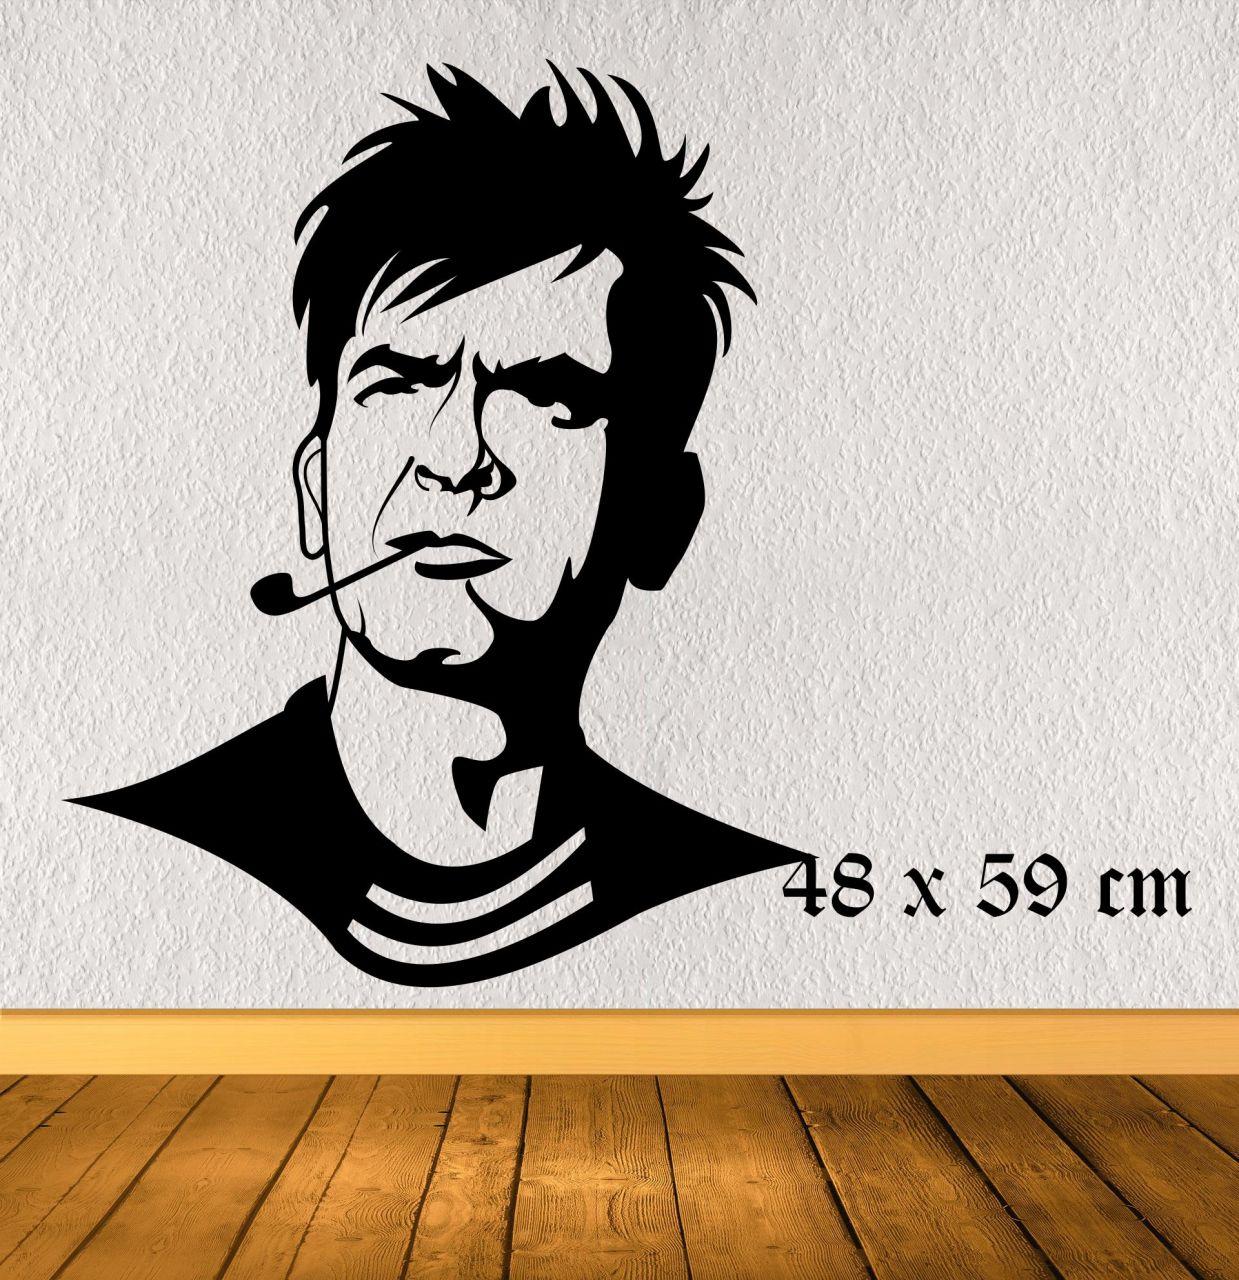 Charlie Sheen links